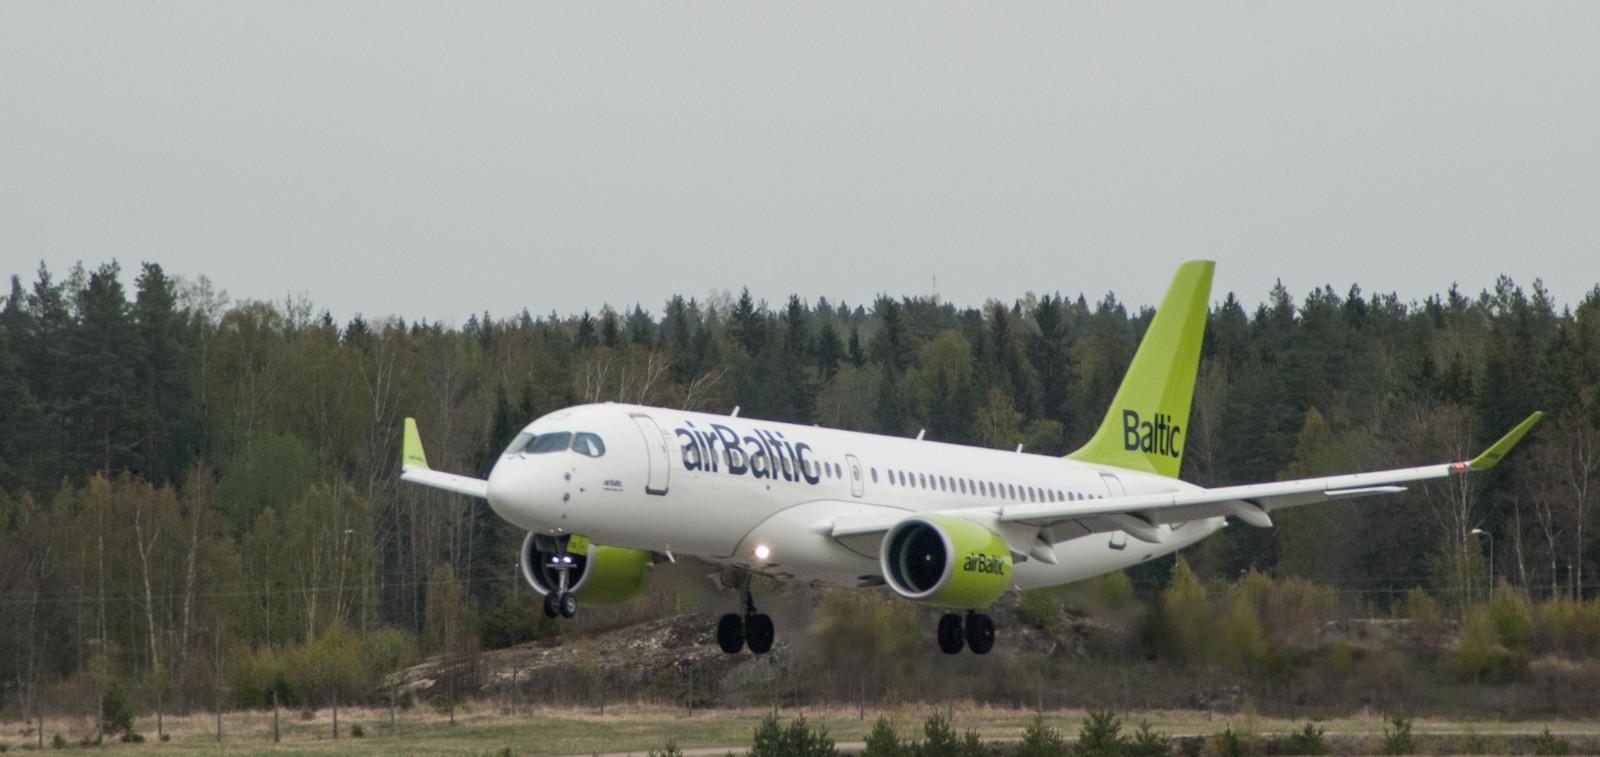 Lennot Turku Riika